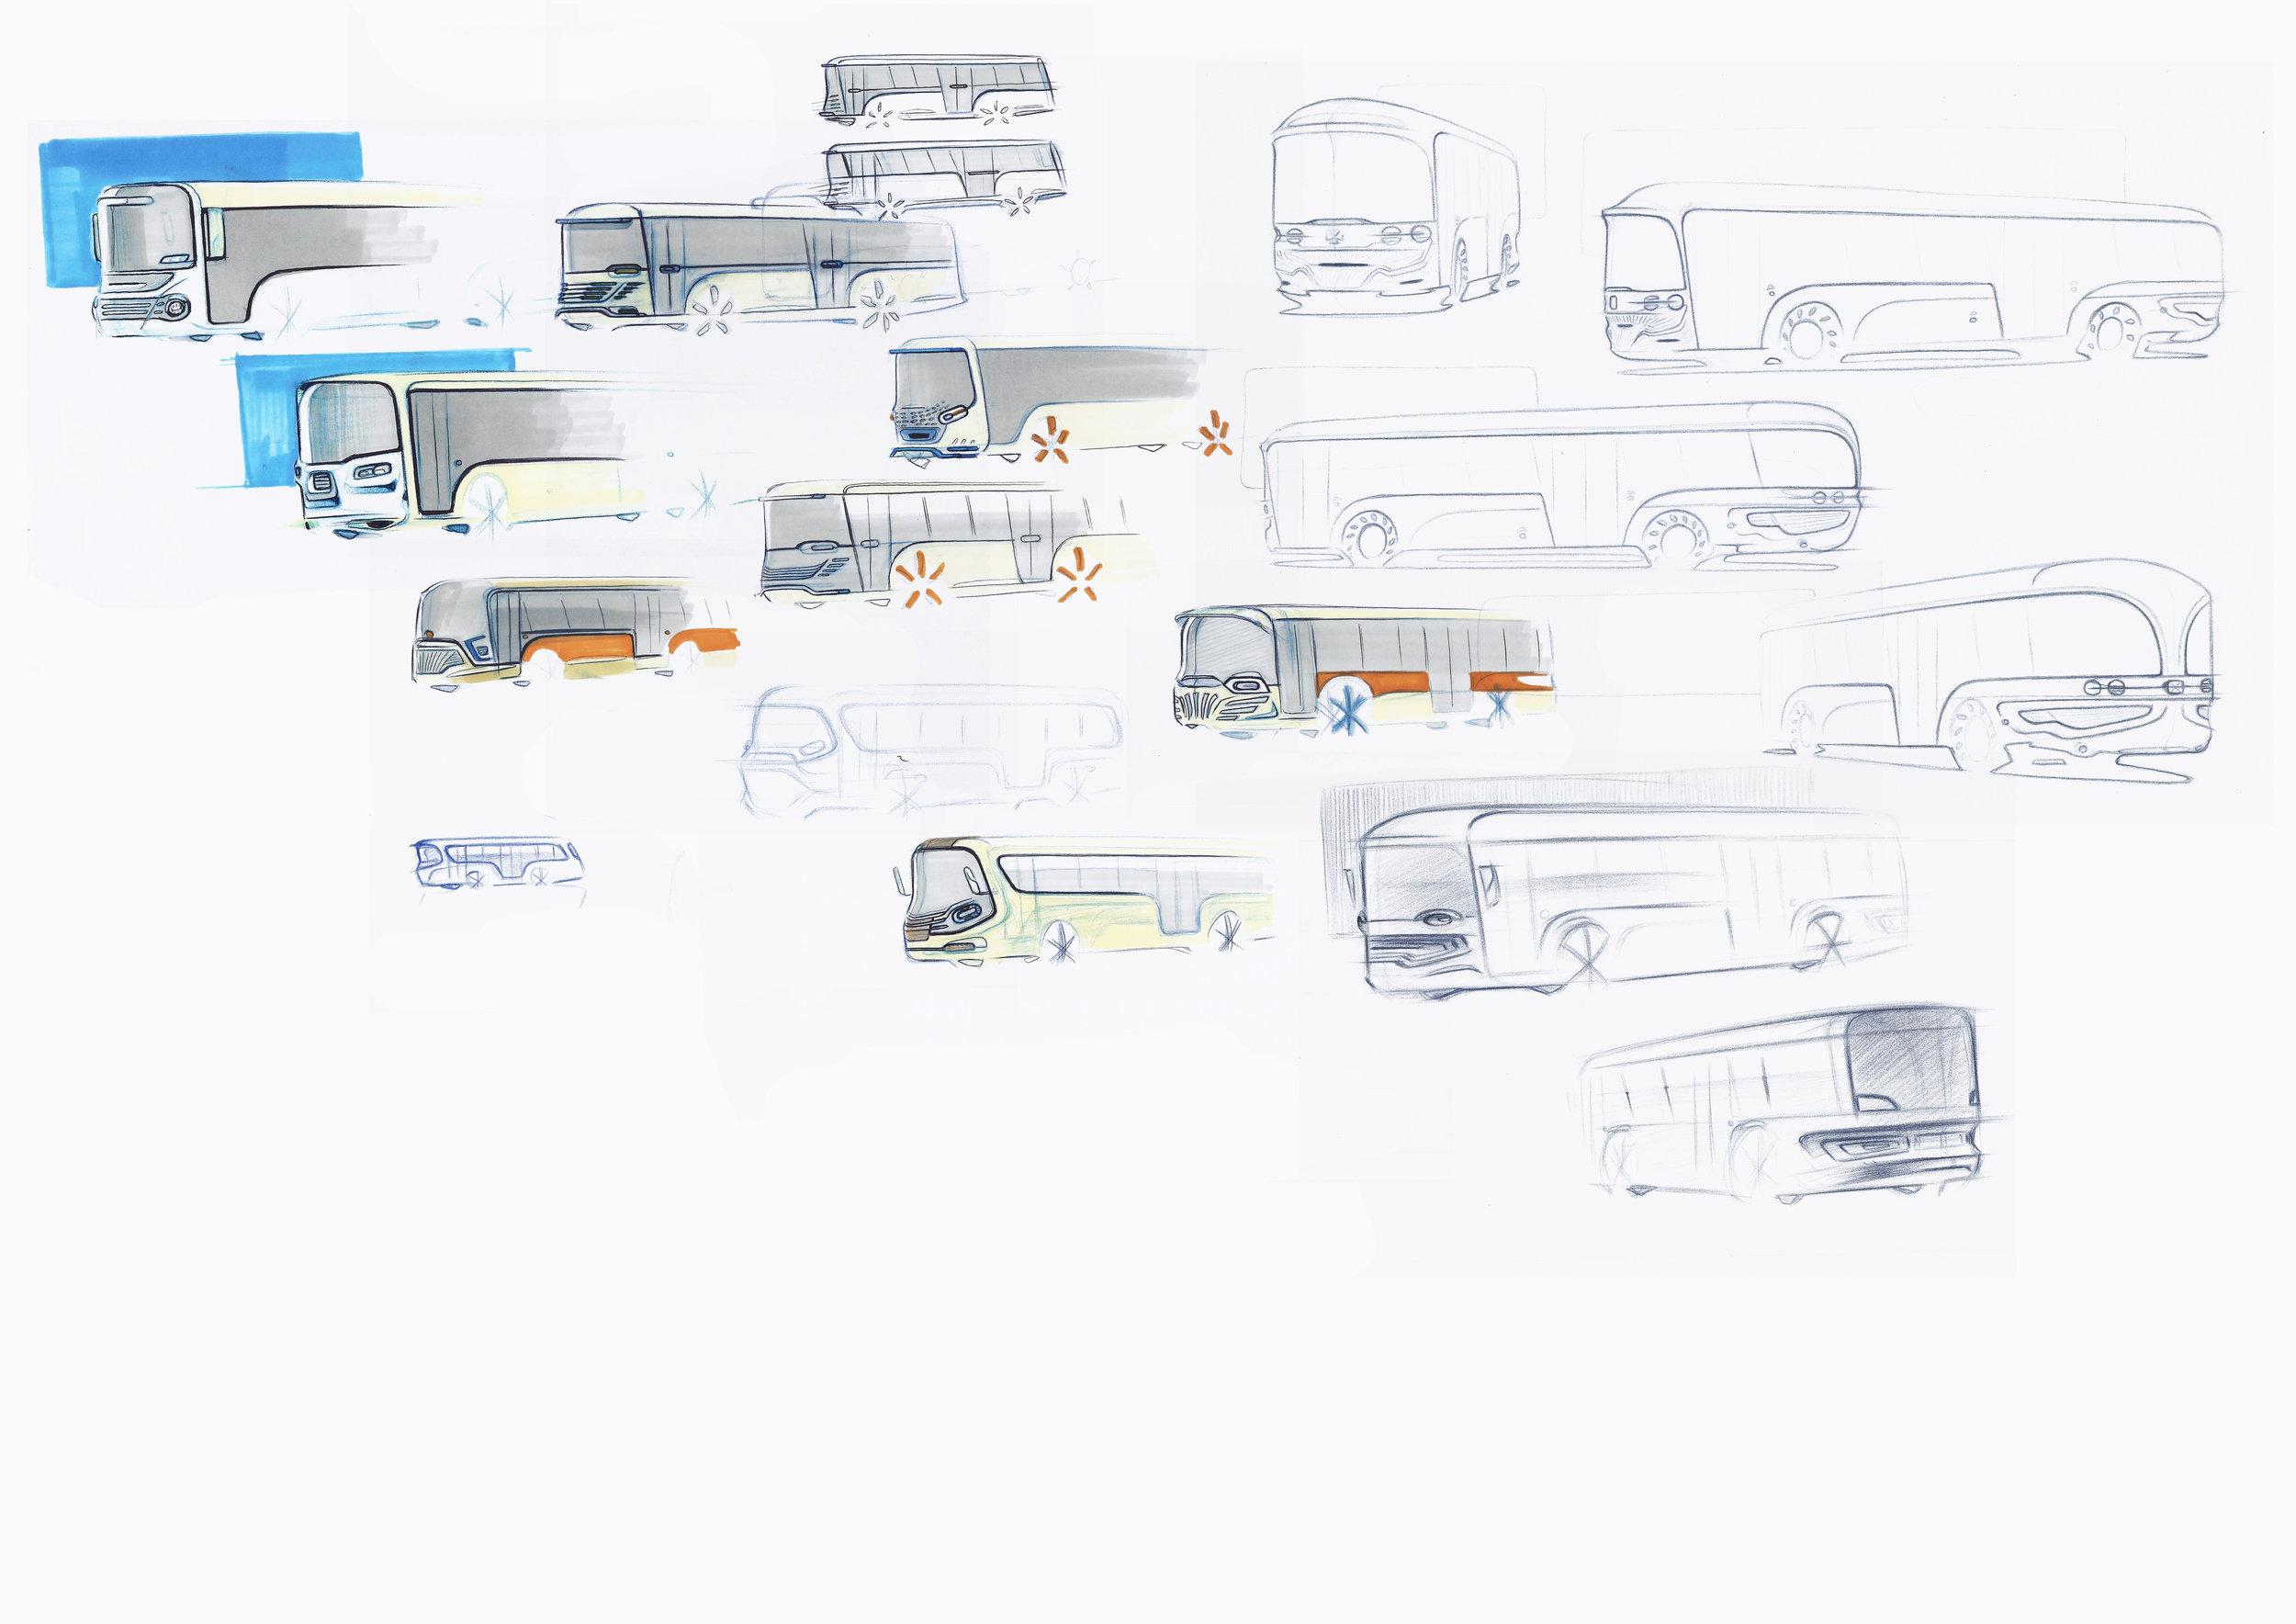 Sketch_01_Mizzi Studio_Malta Bus Reborn.jpg